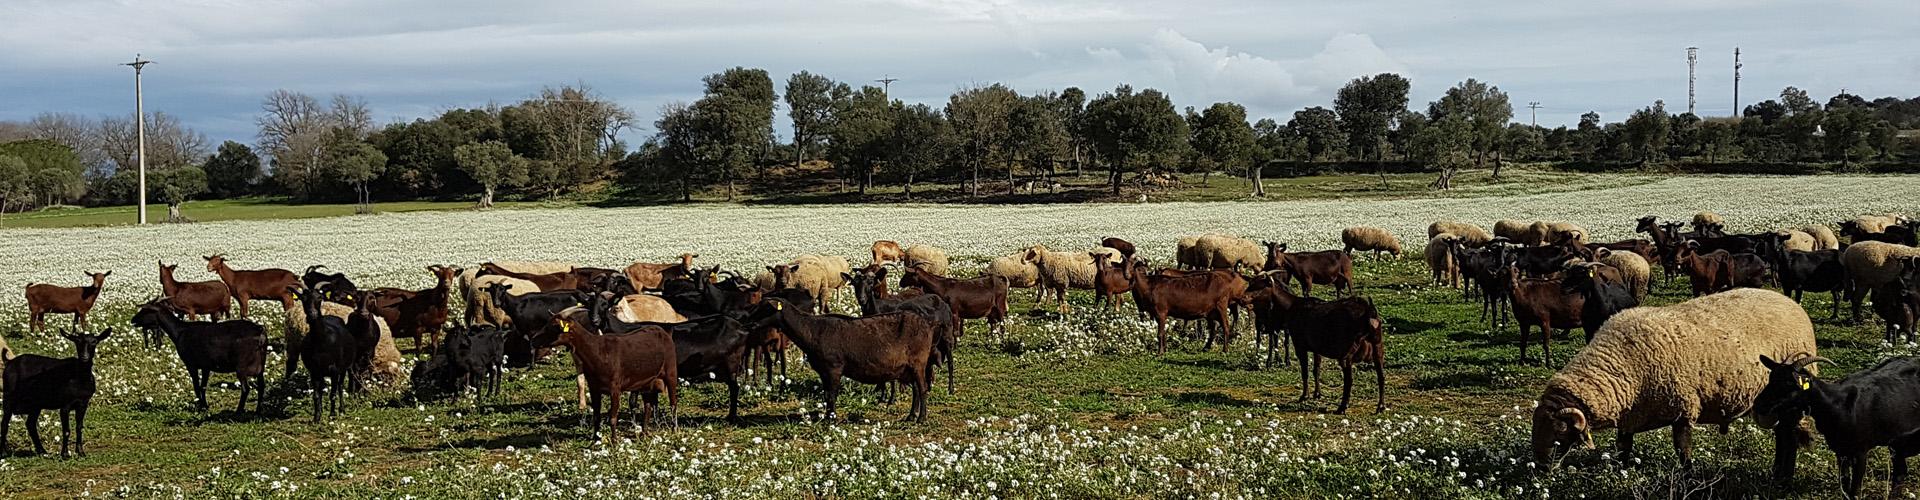 slider cabras campo